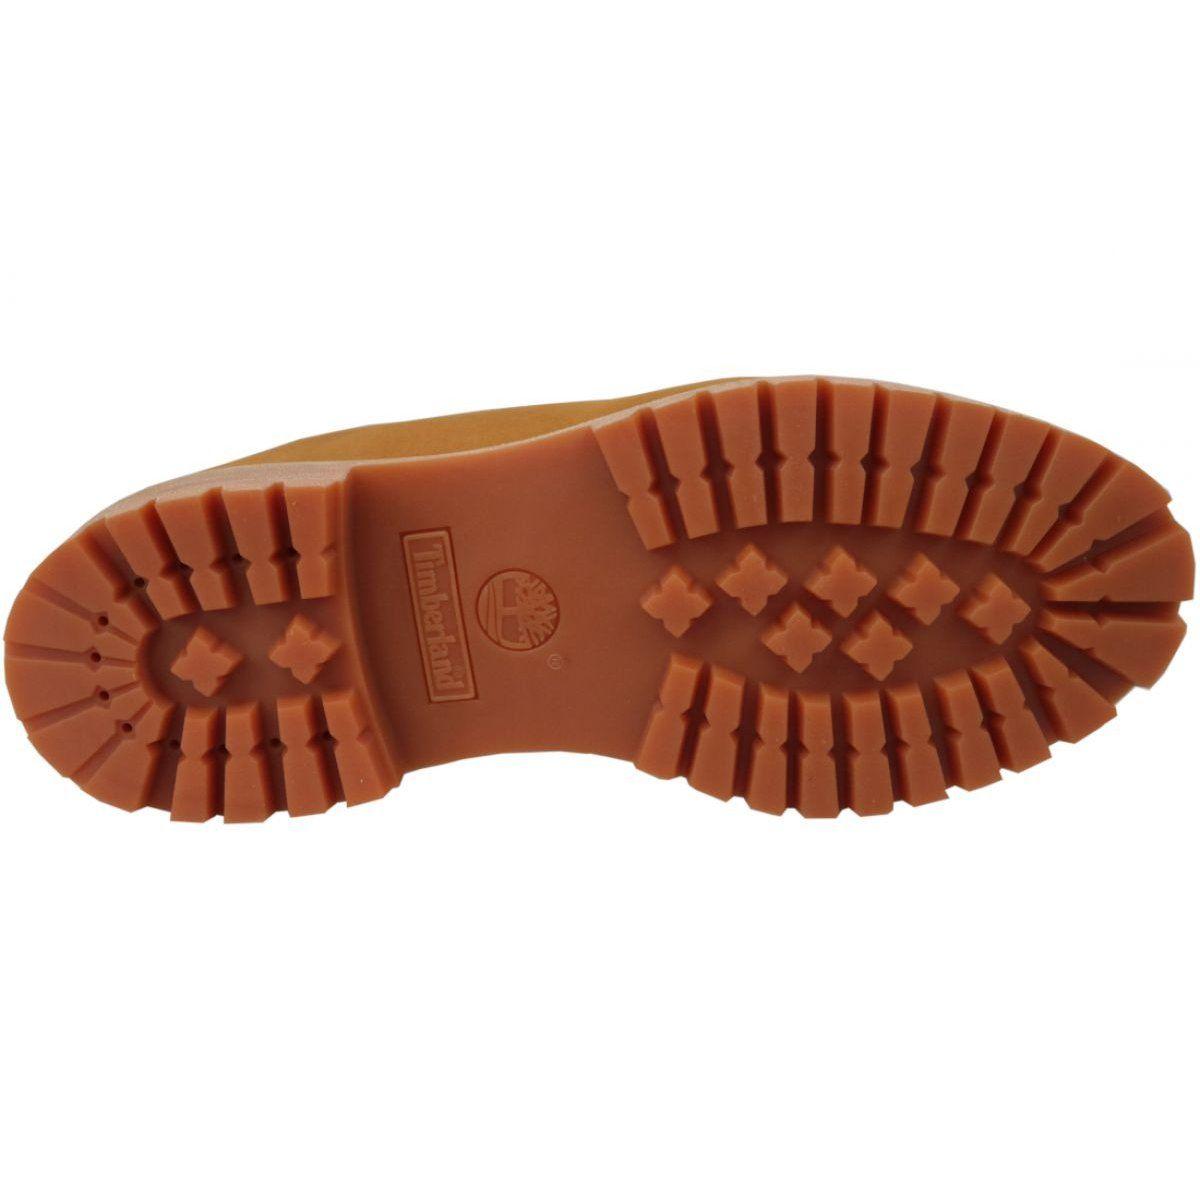 Buty Zimowe Timberland 6 Inch Boot M 73540 Zolte Timberland 6 Inch Boots Timberland Winter Shoes